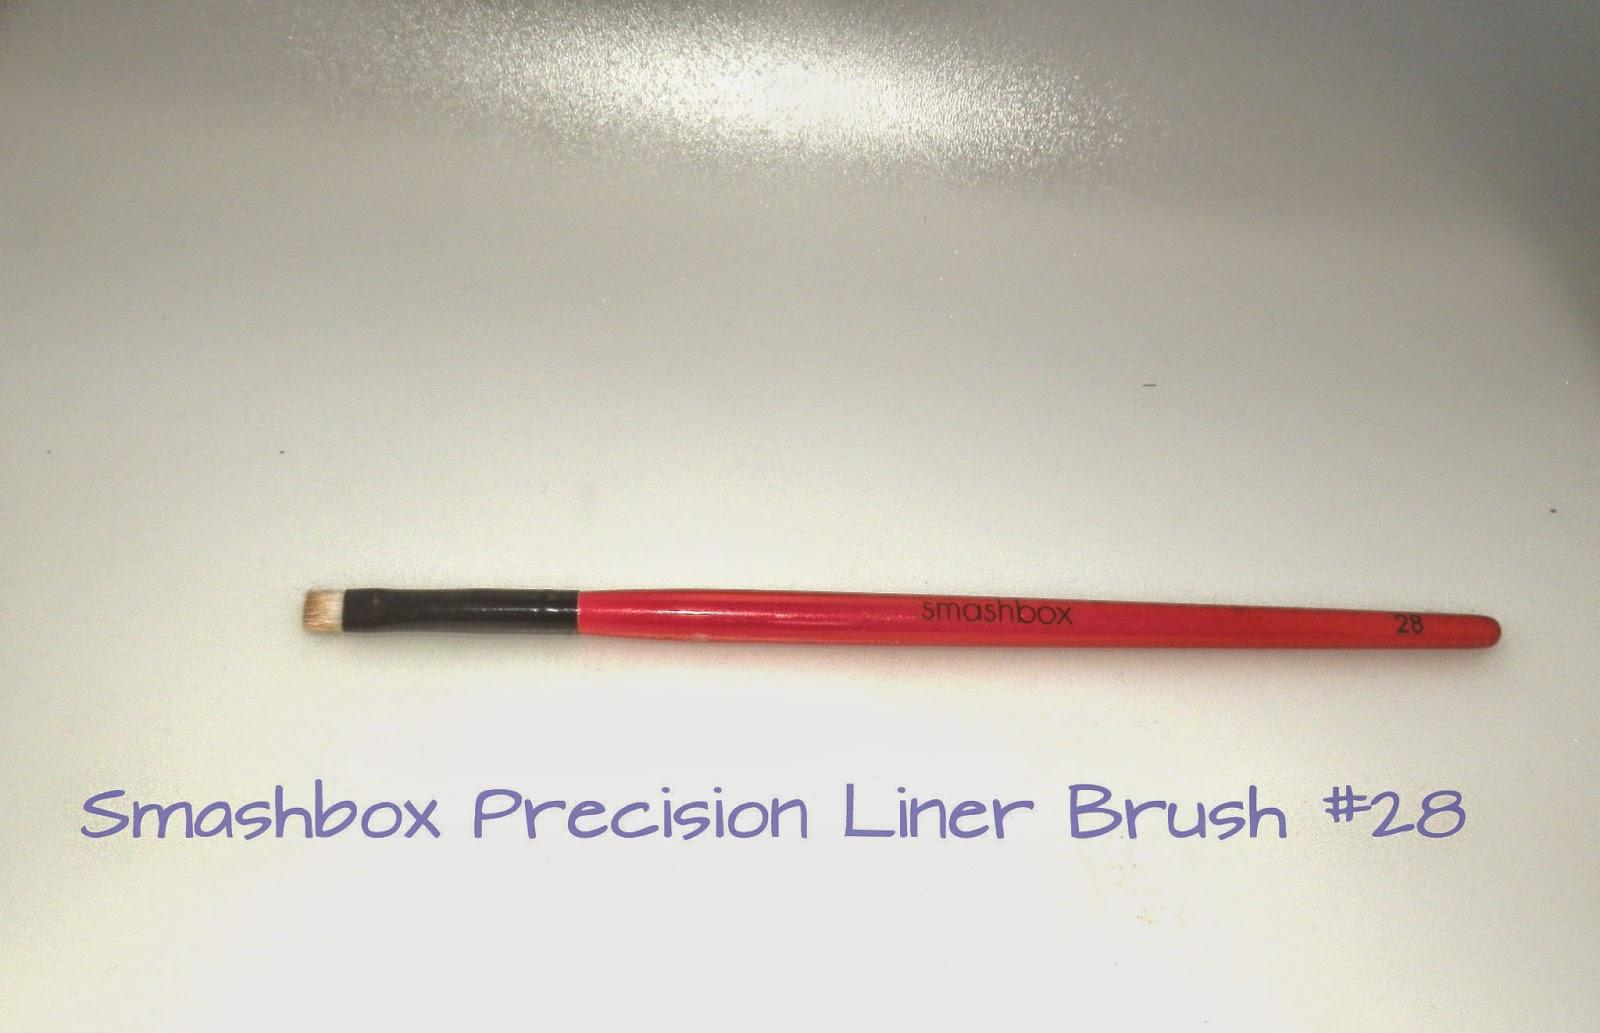 Smashbox Precision Liner Brush #28